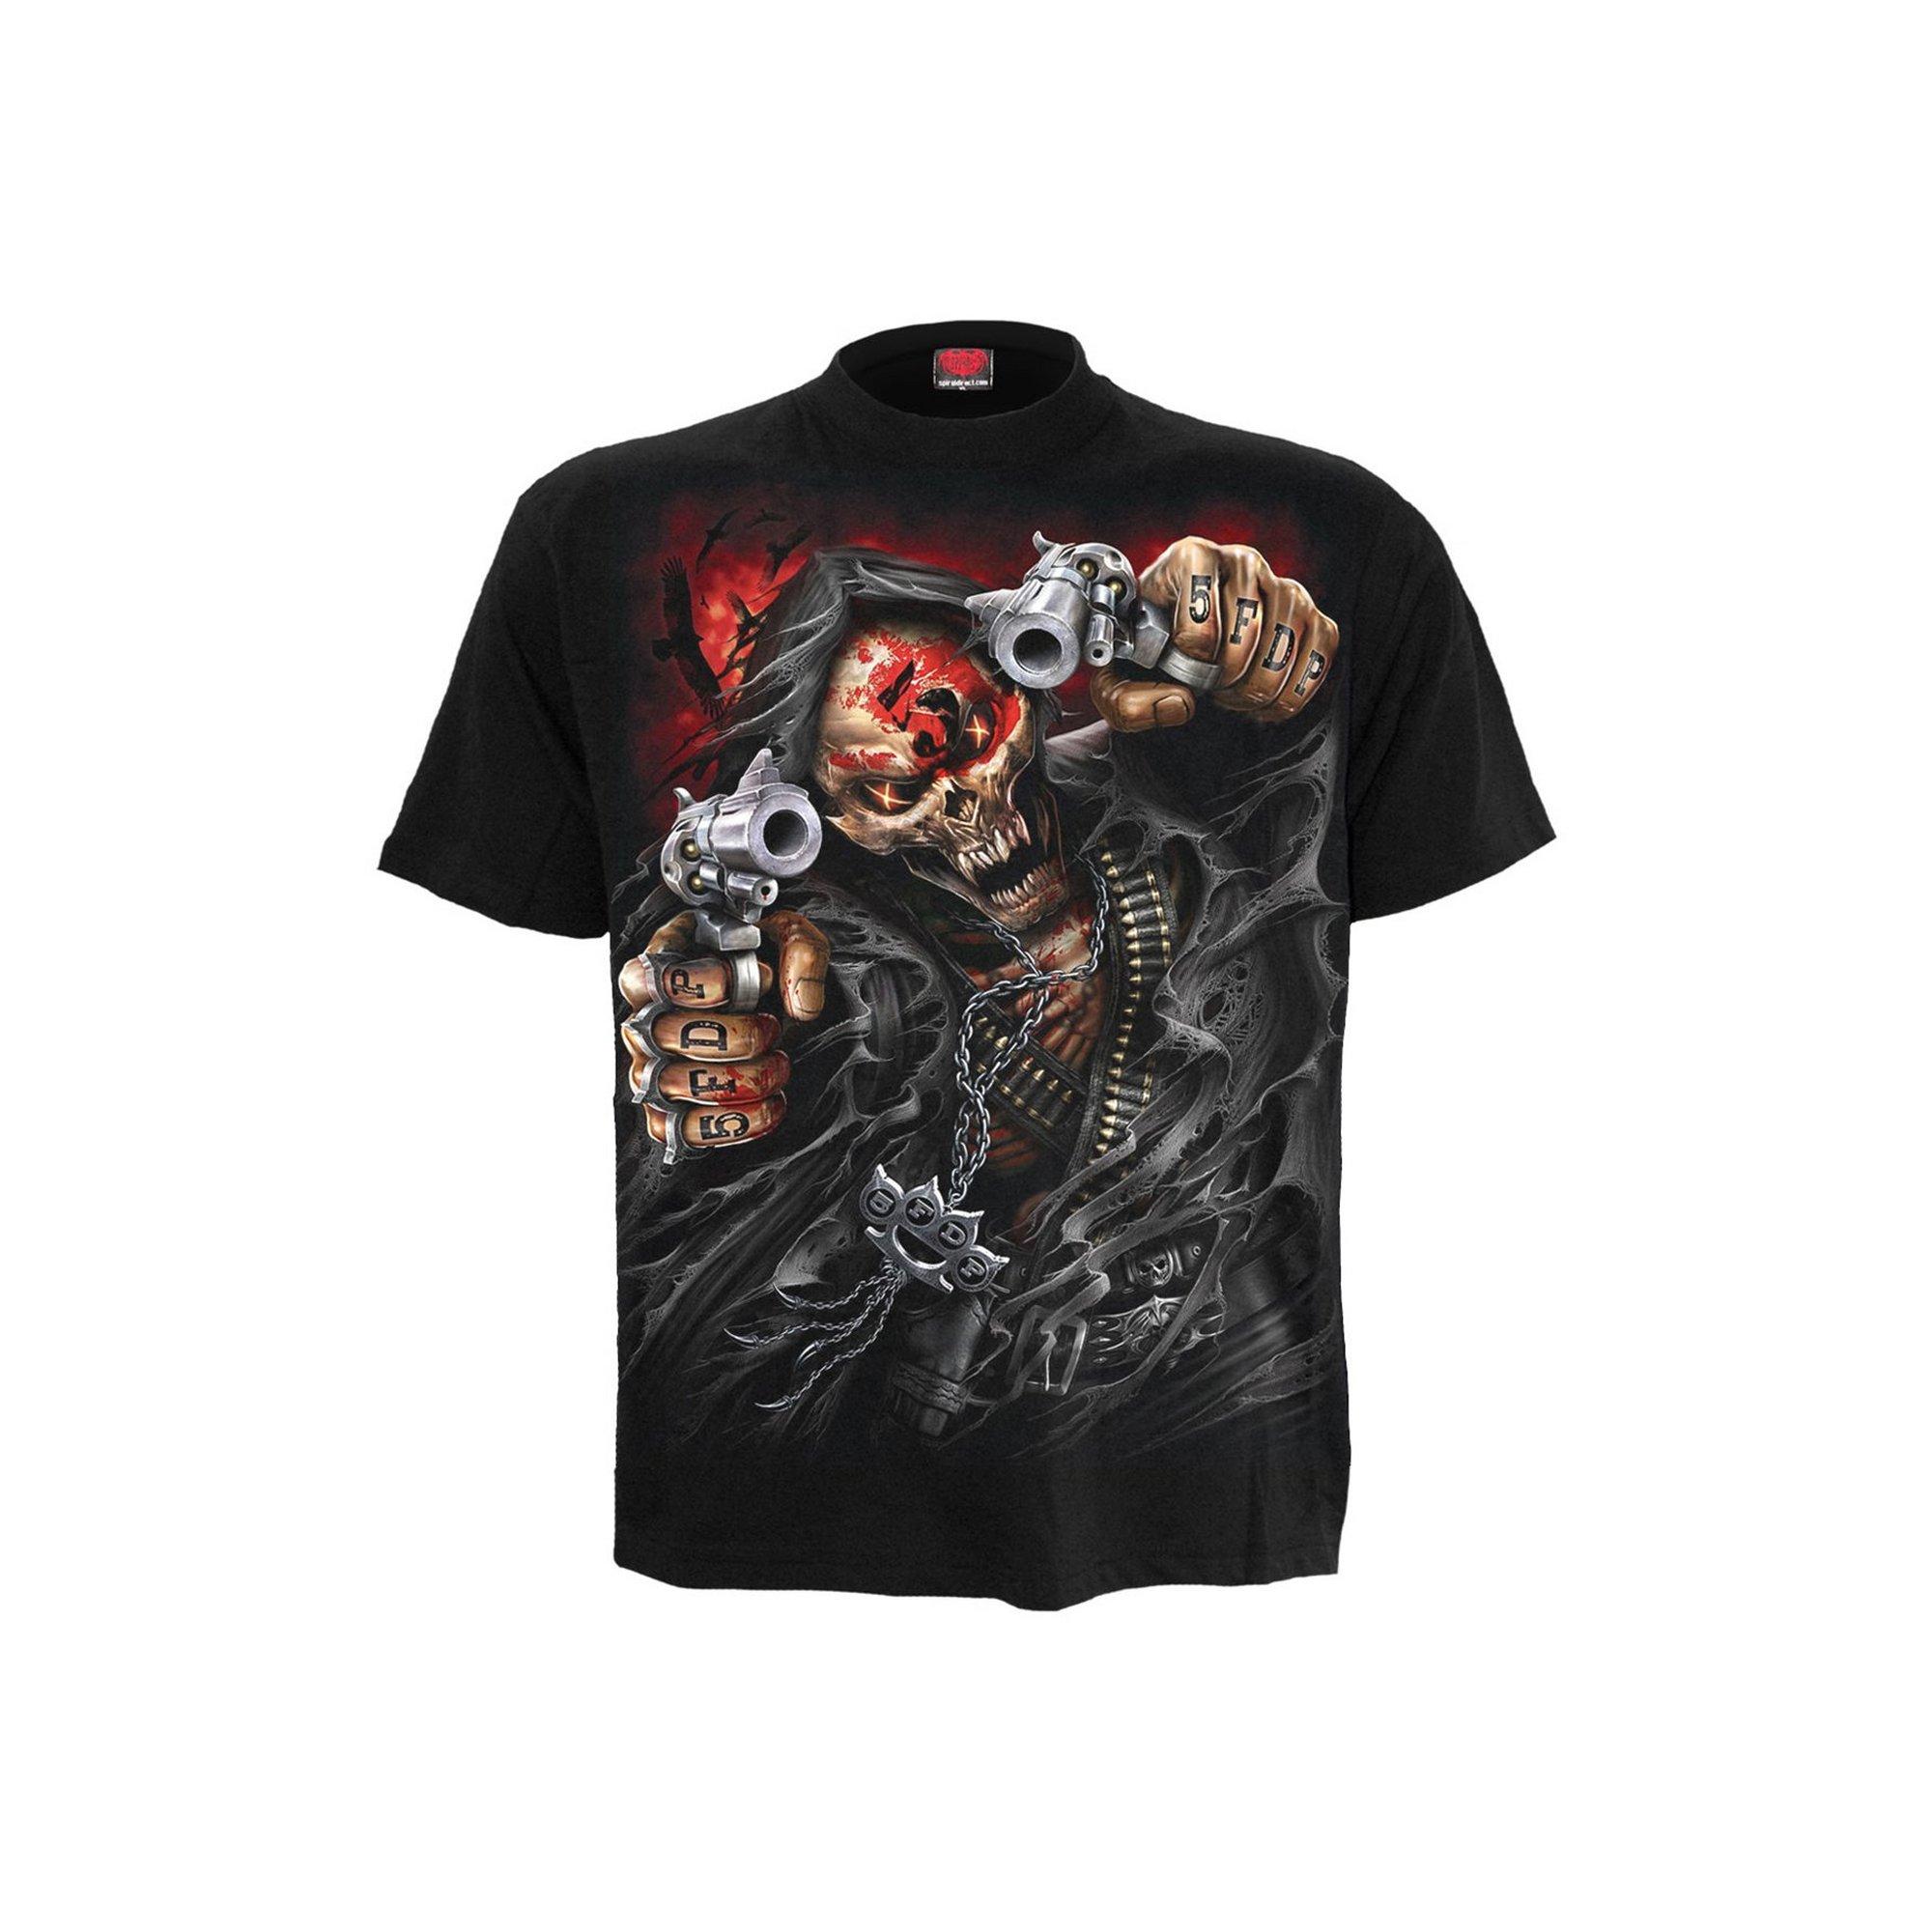 Image of 5FDP - Assassin Band T-Shirt